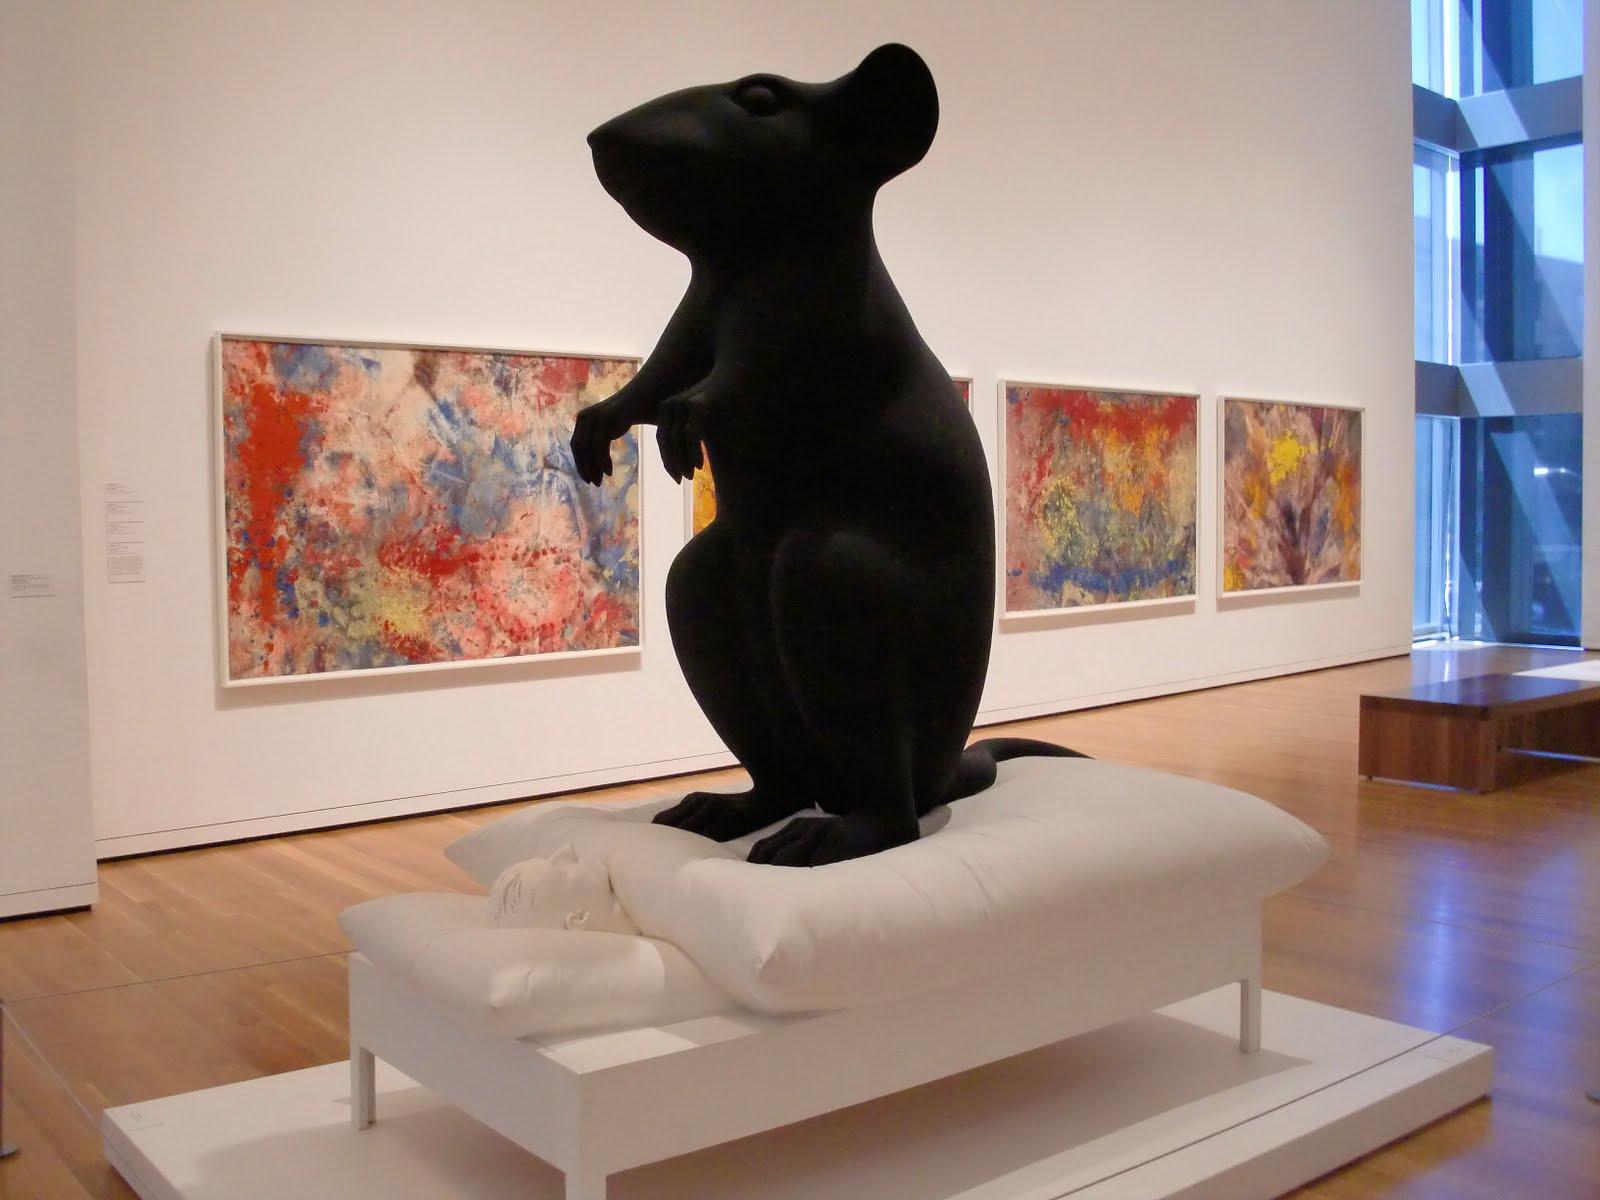 Katharina Fritsch, Man and mouse, 1991-1992